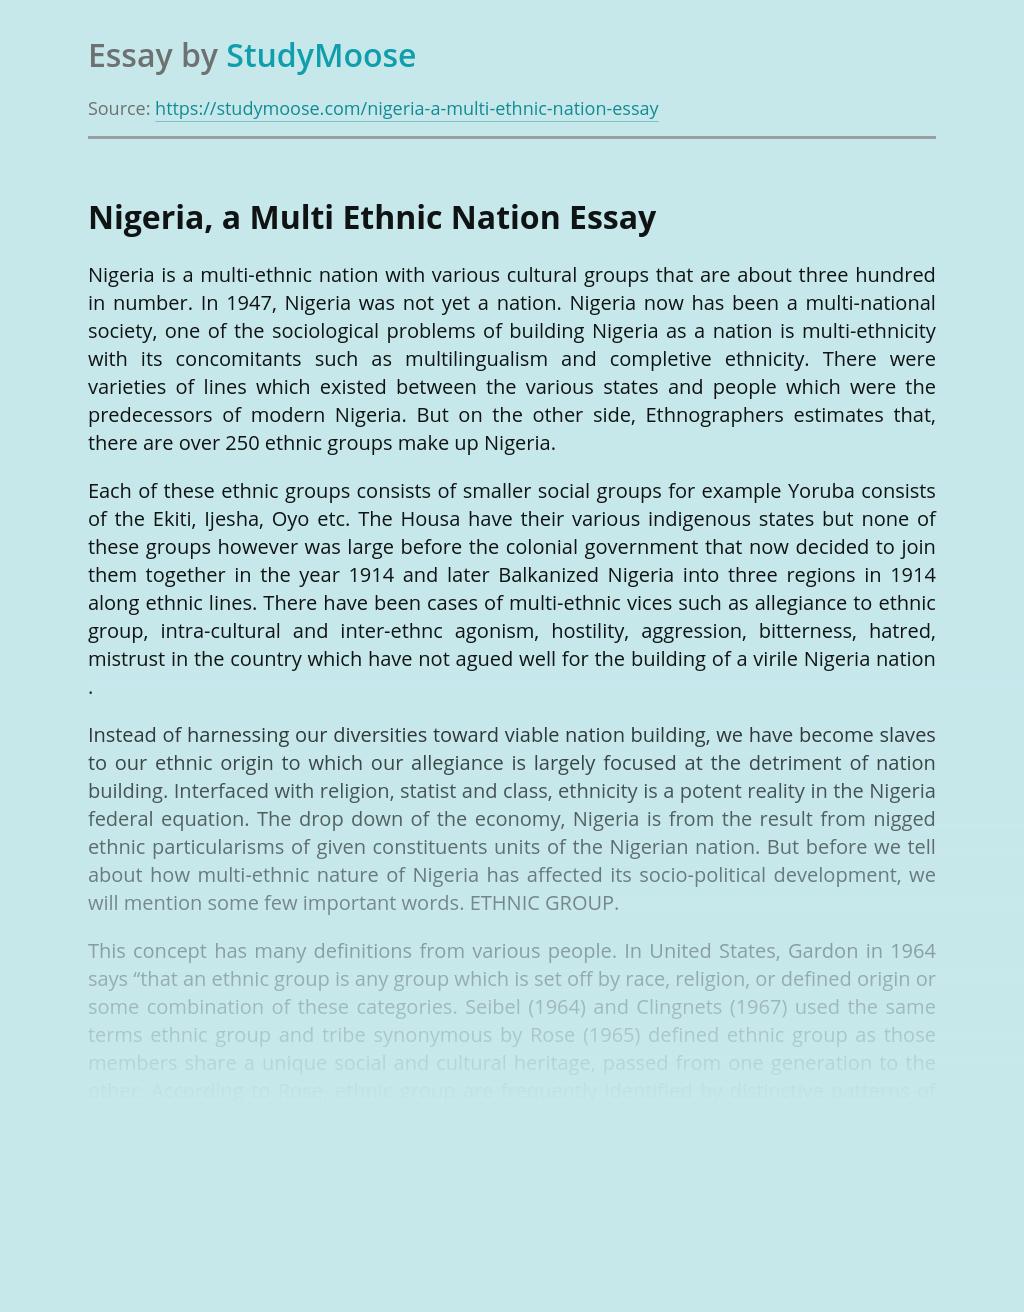 Nigeria, a Multi Ethnic Nation